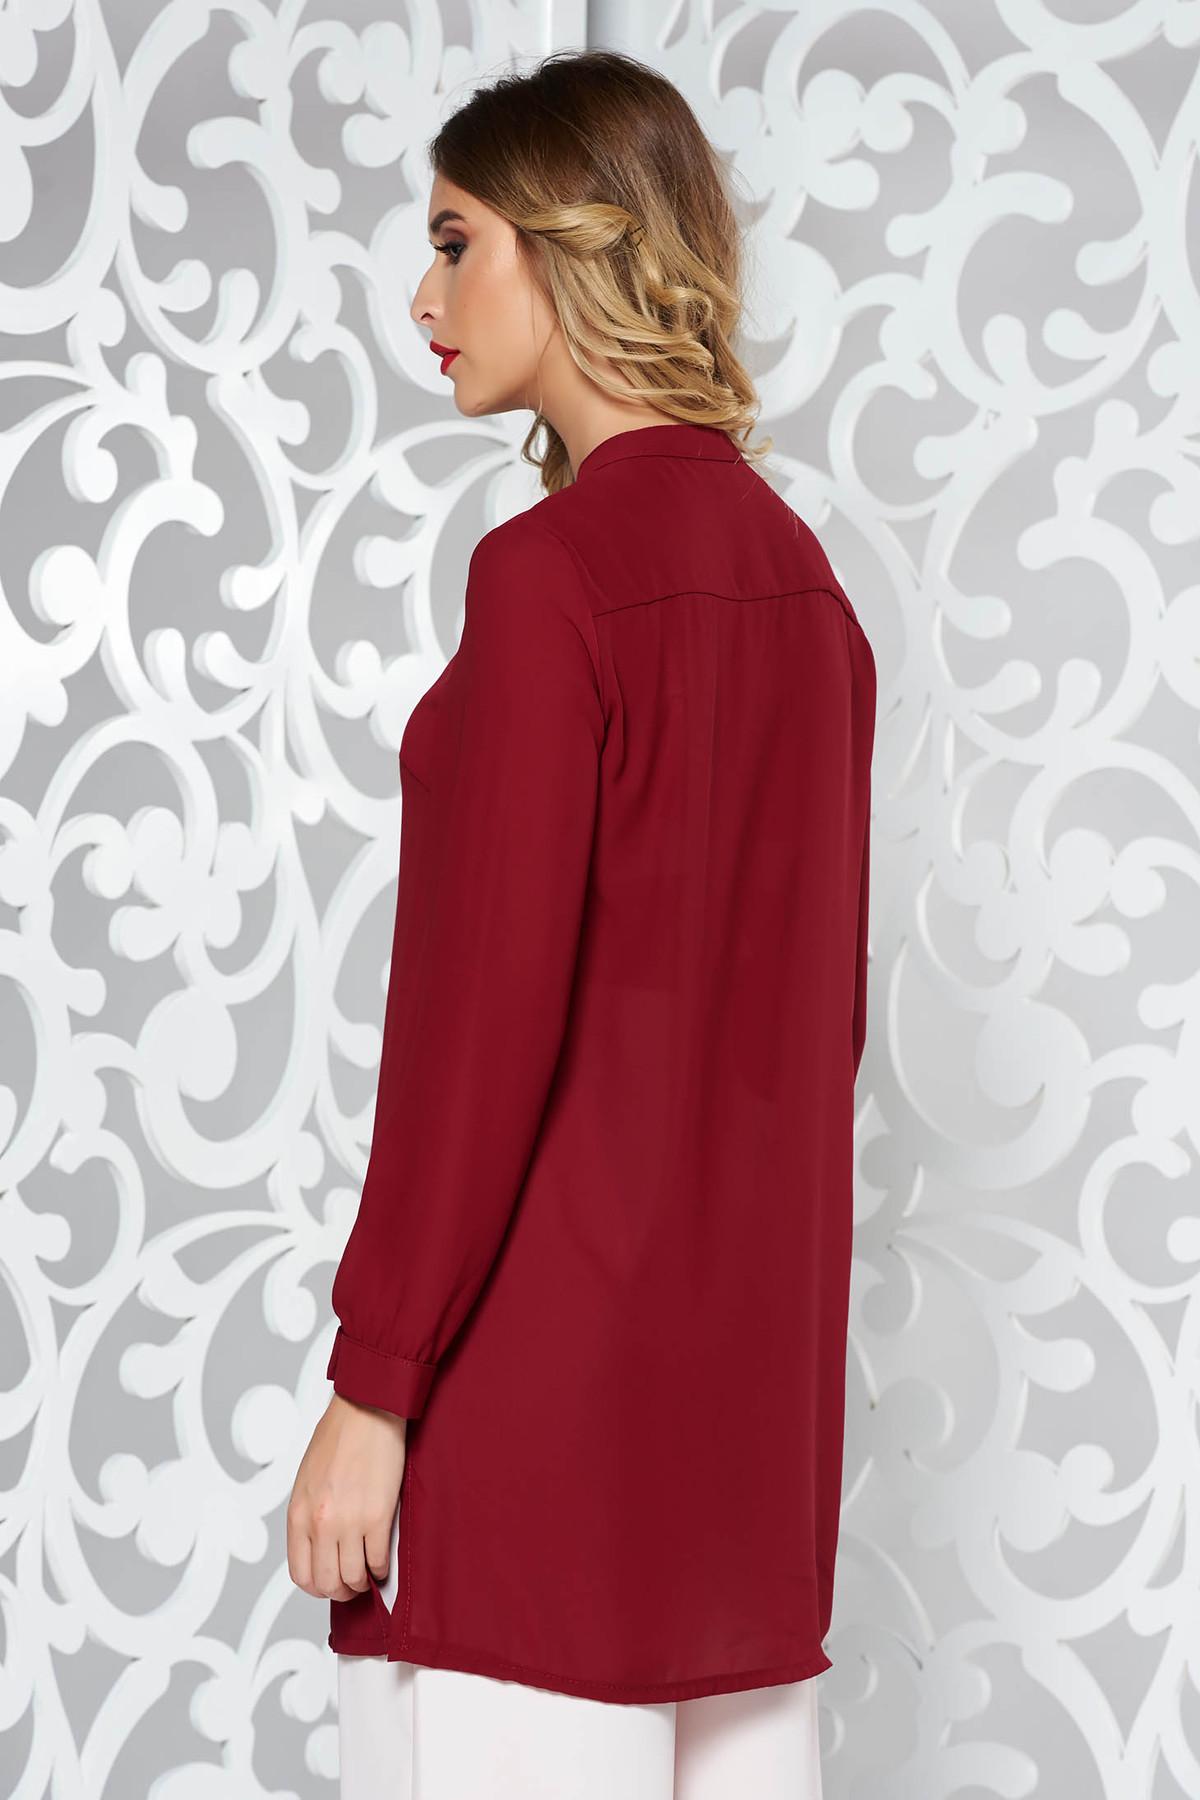 Camasa dama SunShine visinie eleganta cu croi larg din din material usor transparent cu maneca lunga